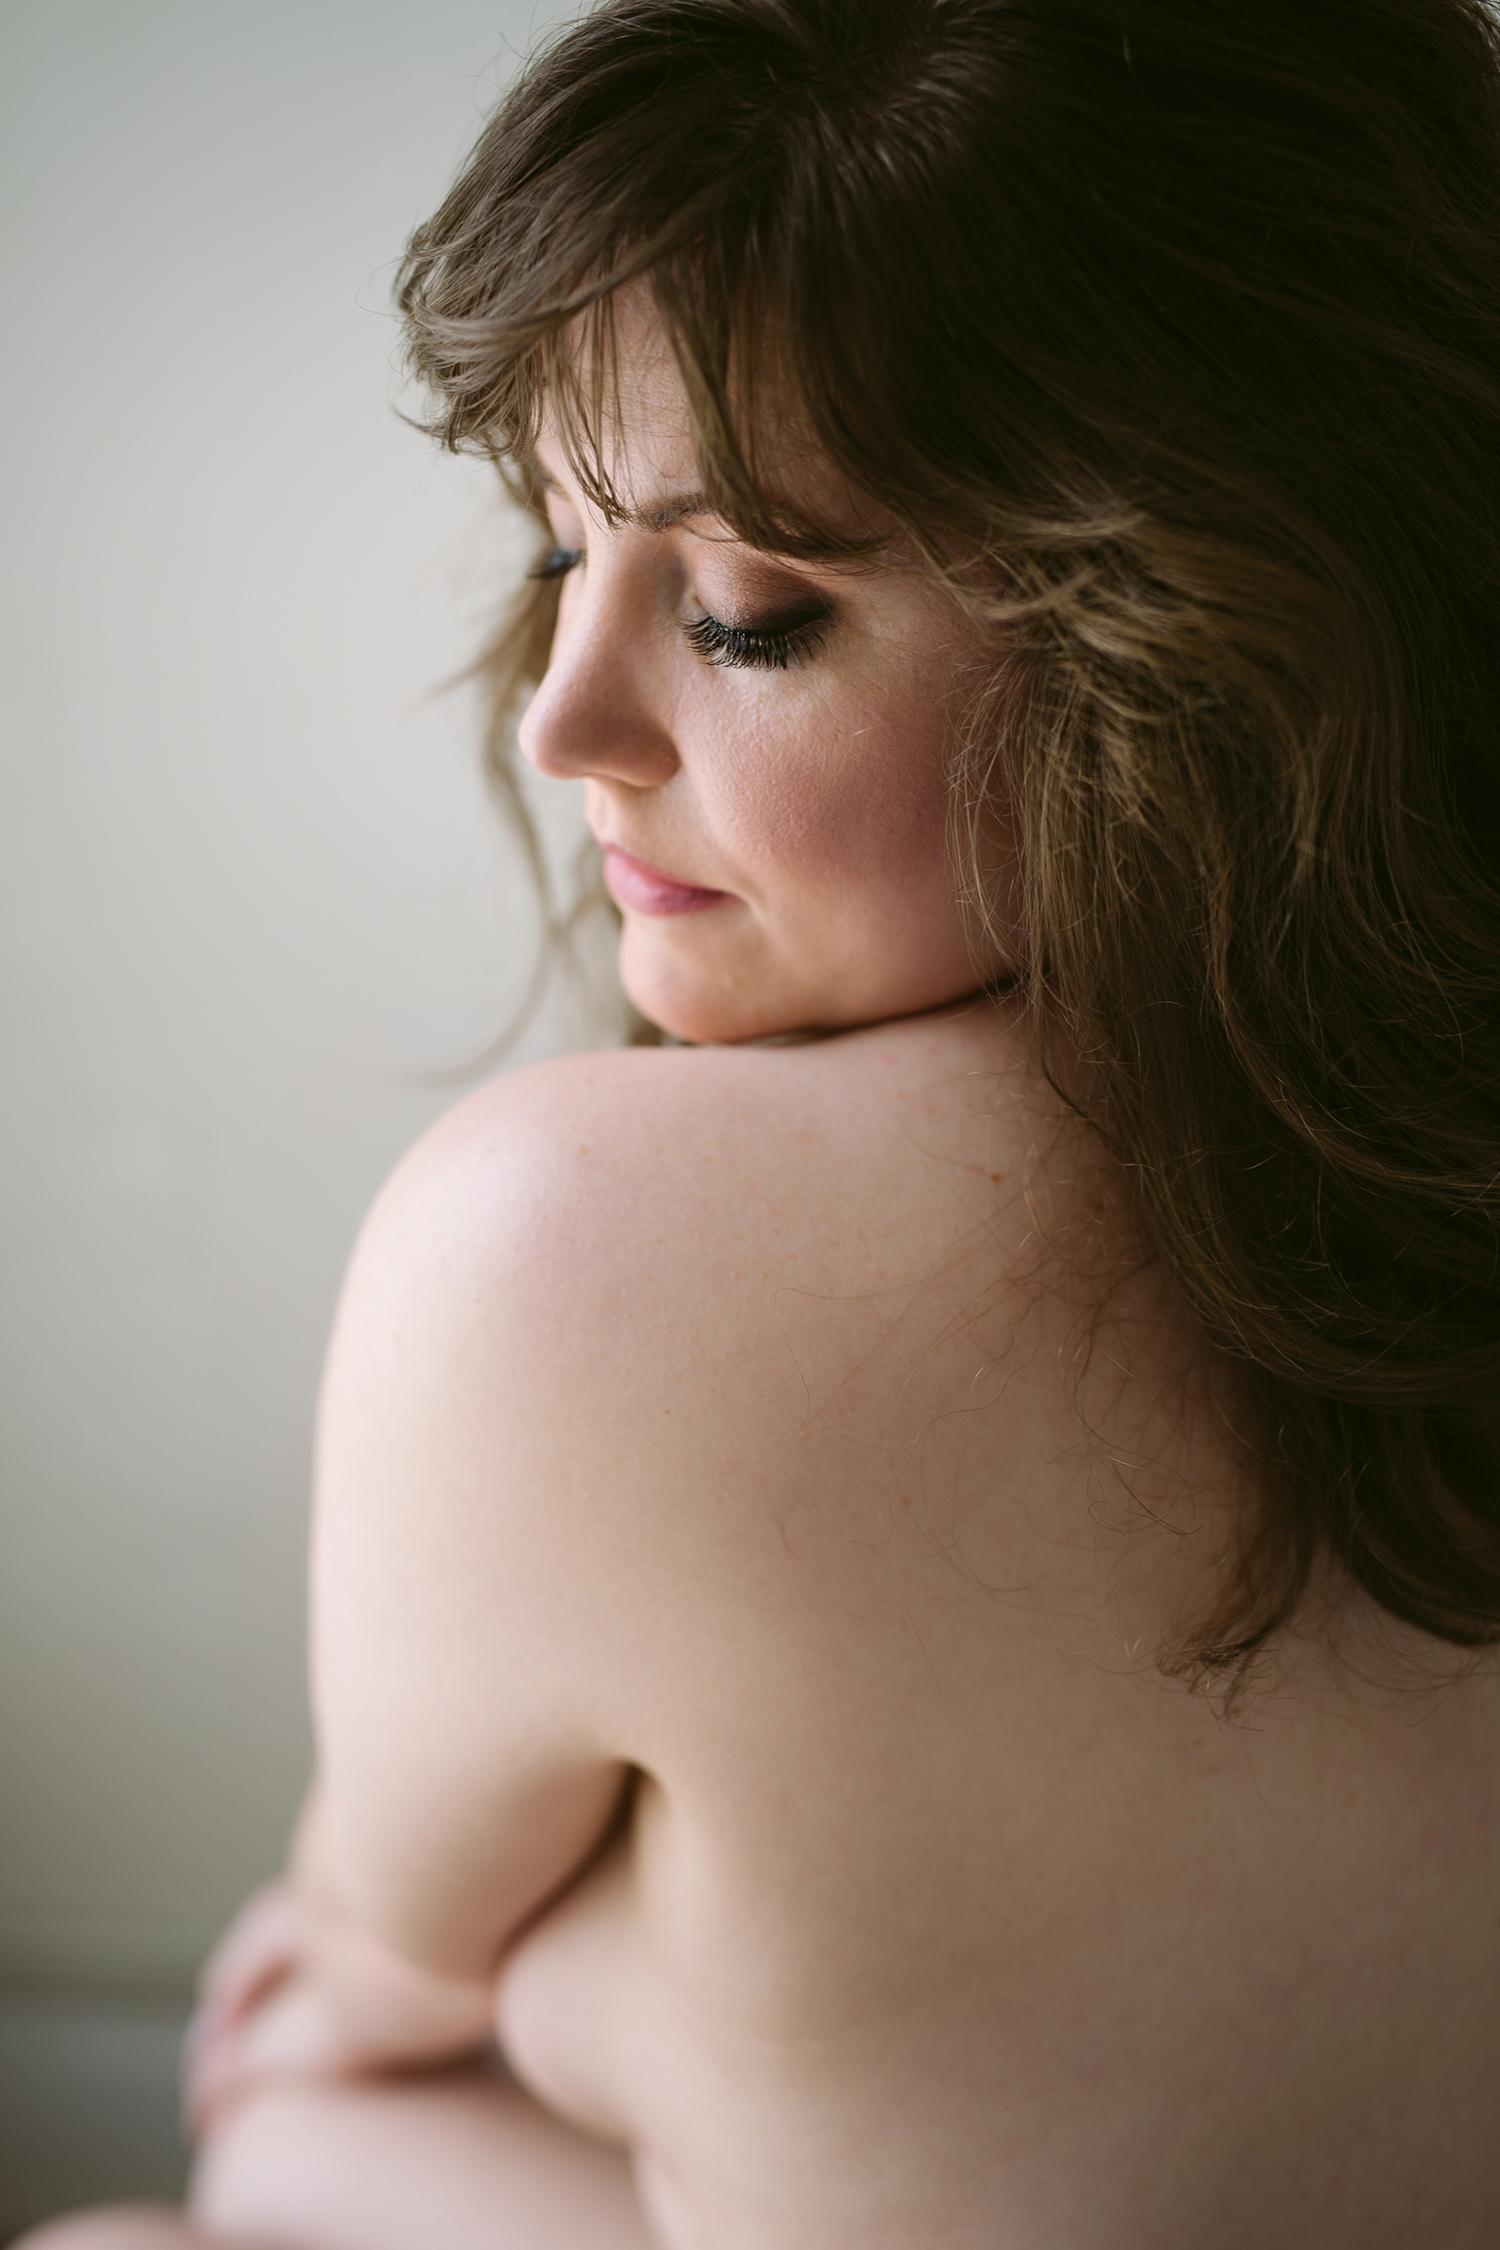 austin-texas-classy-boudoir-photography-KBB49.jpg